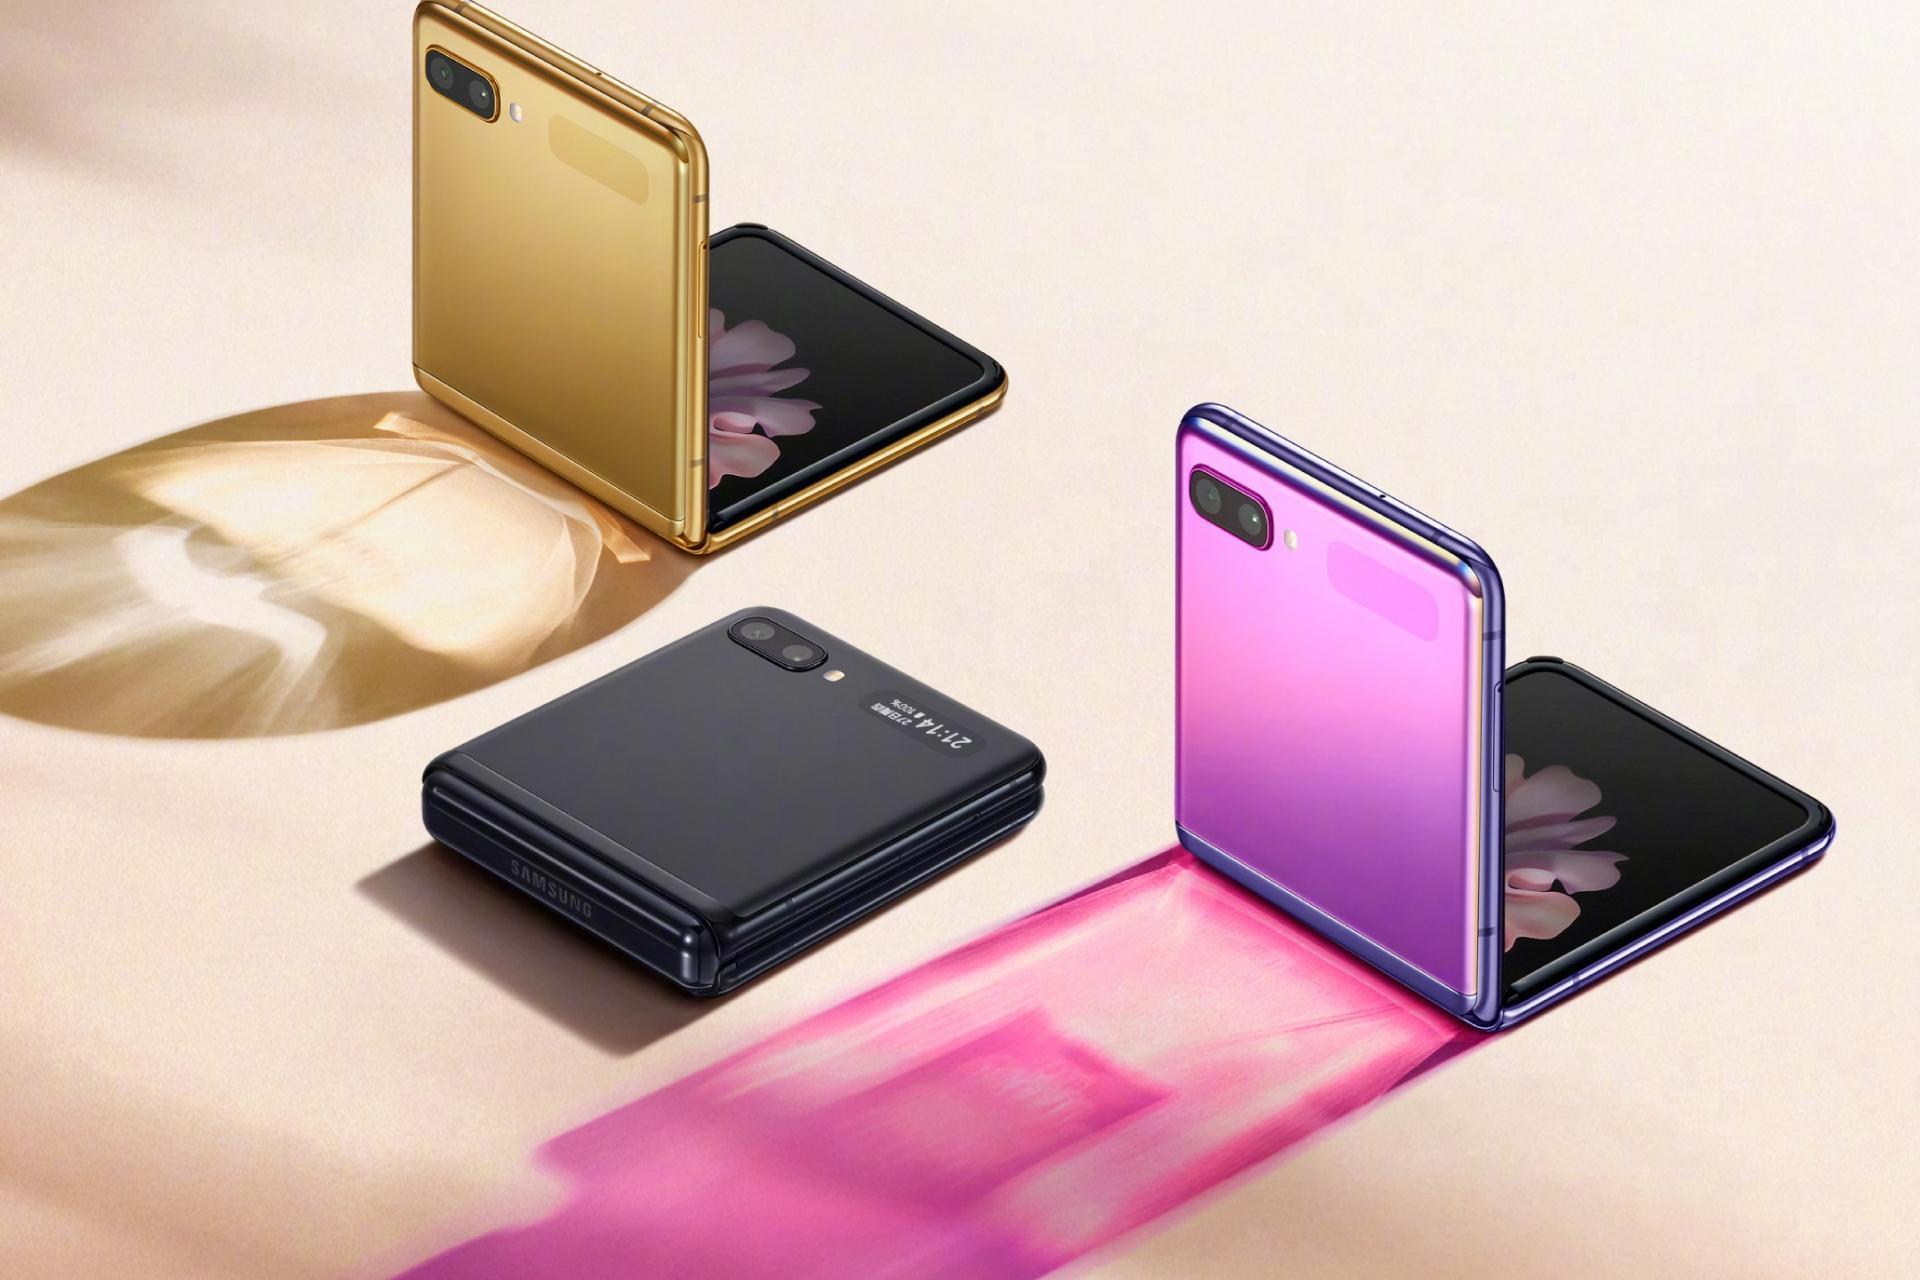 Galaxy Z Flip3或将2021年下半年发布:搭载屏下摄像头